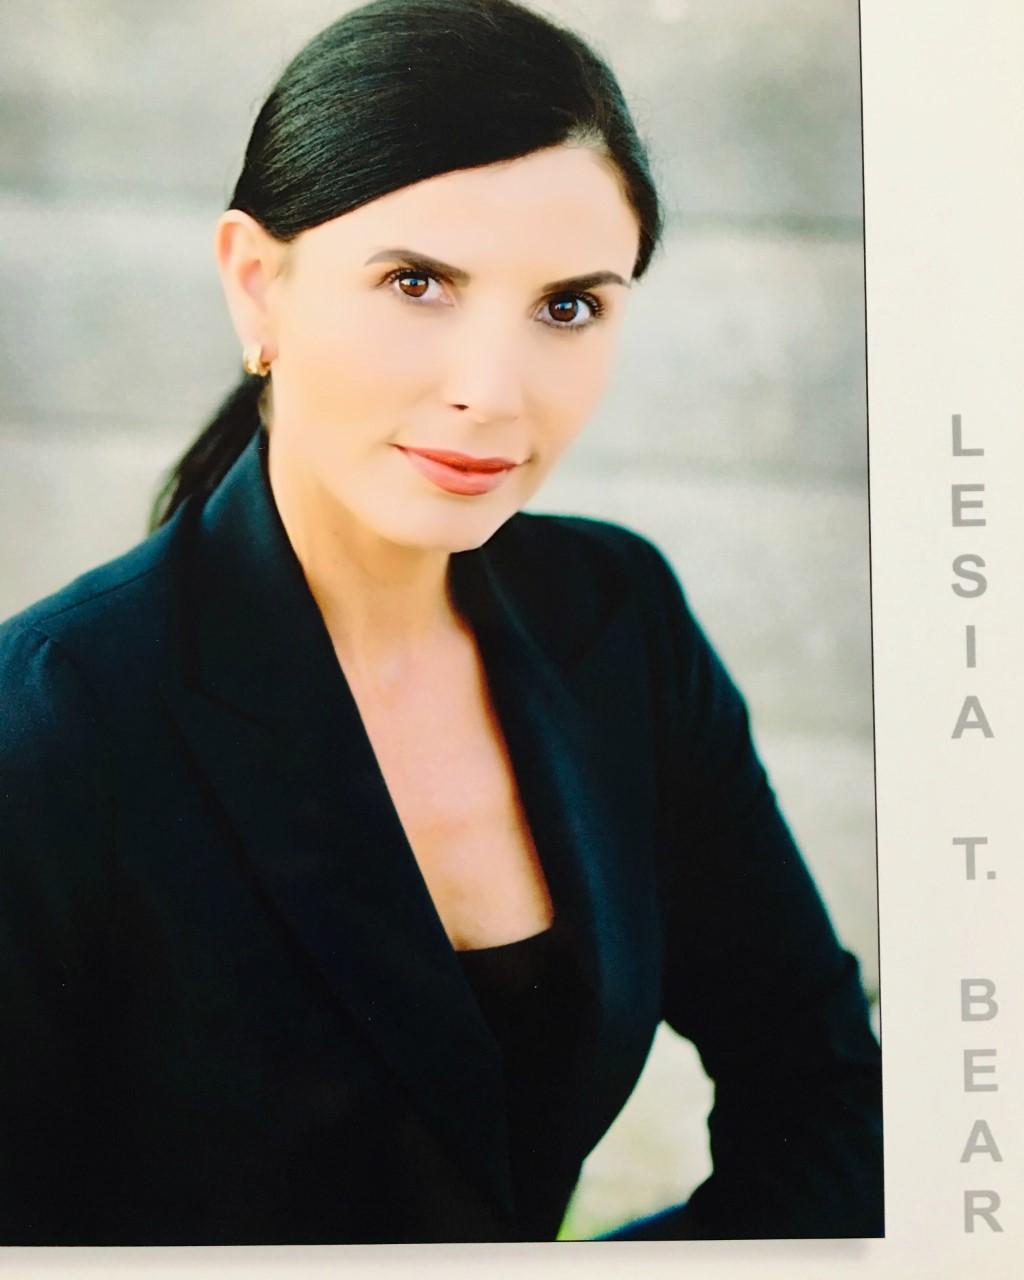 Lesia T Bear